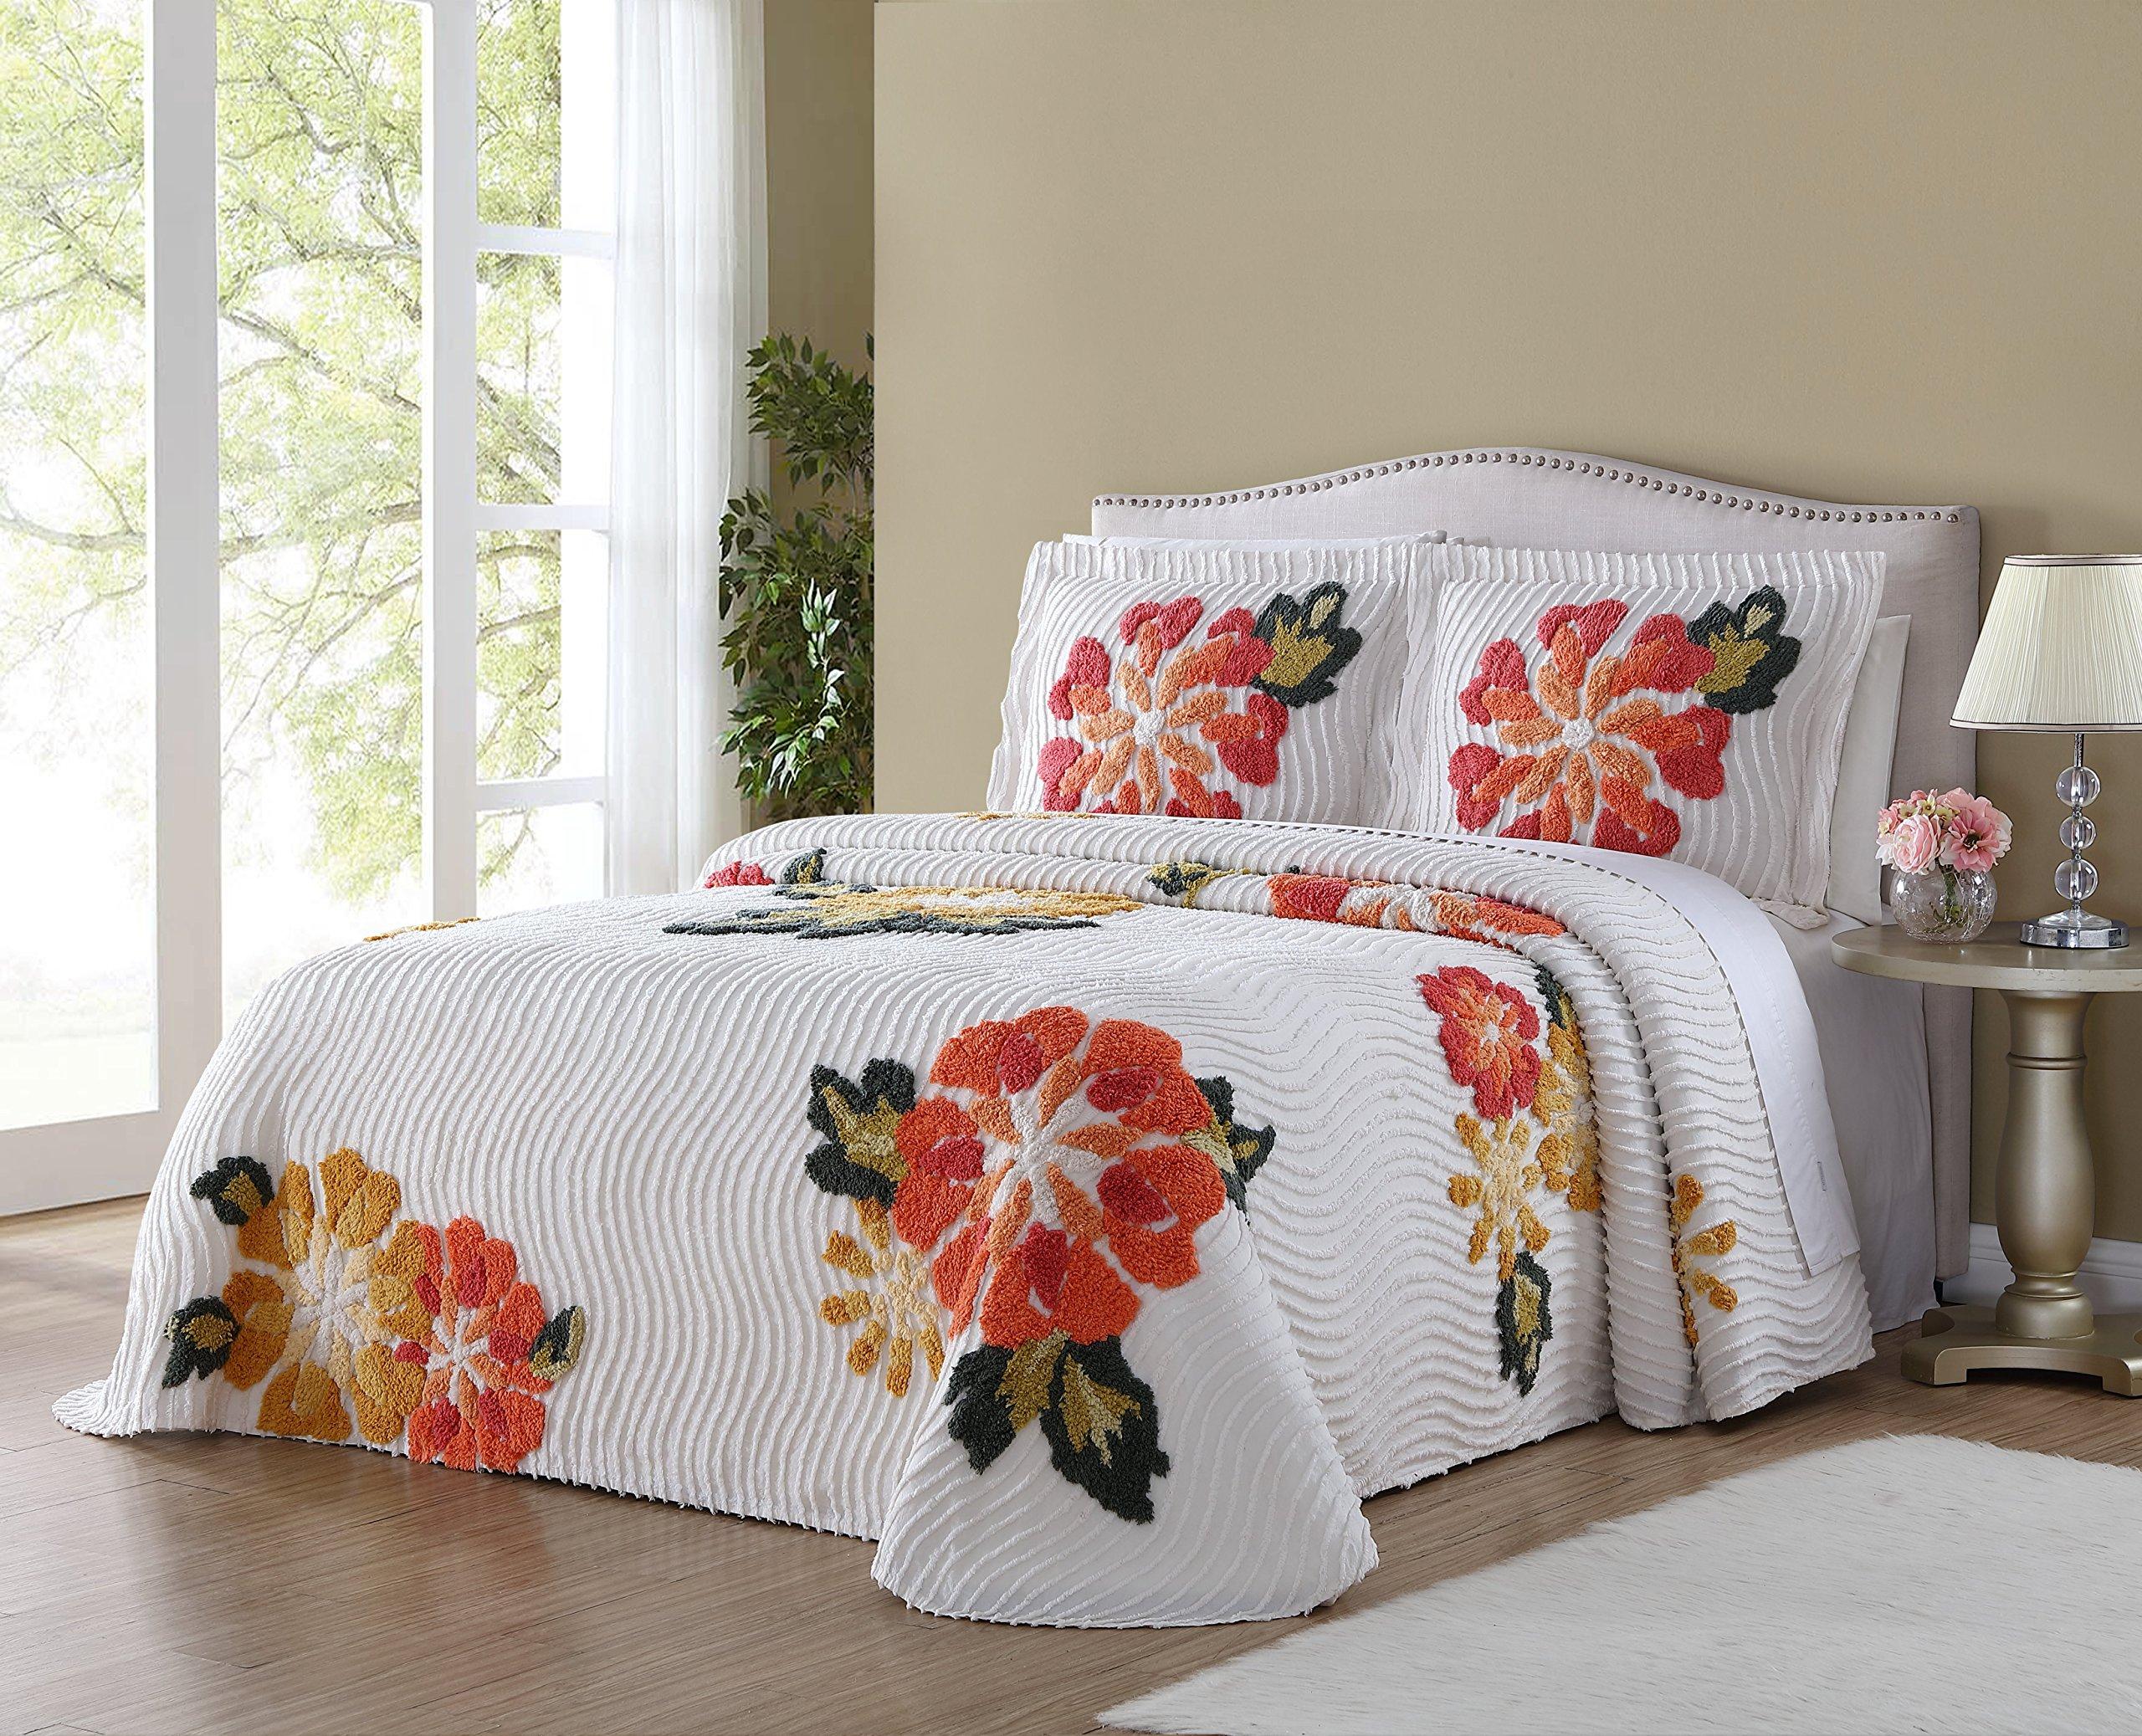 Ellison Autumn Chenille Bedspread, Queen